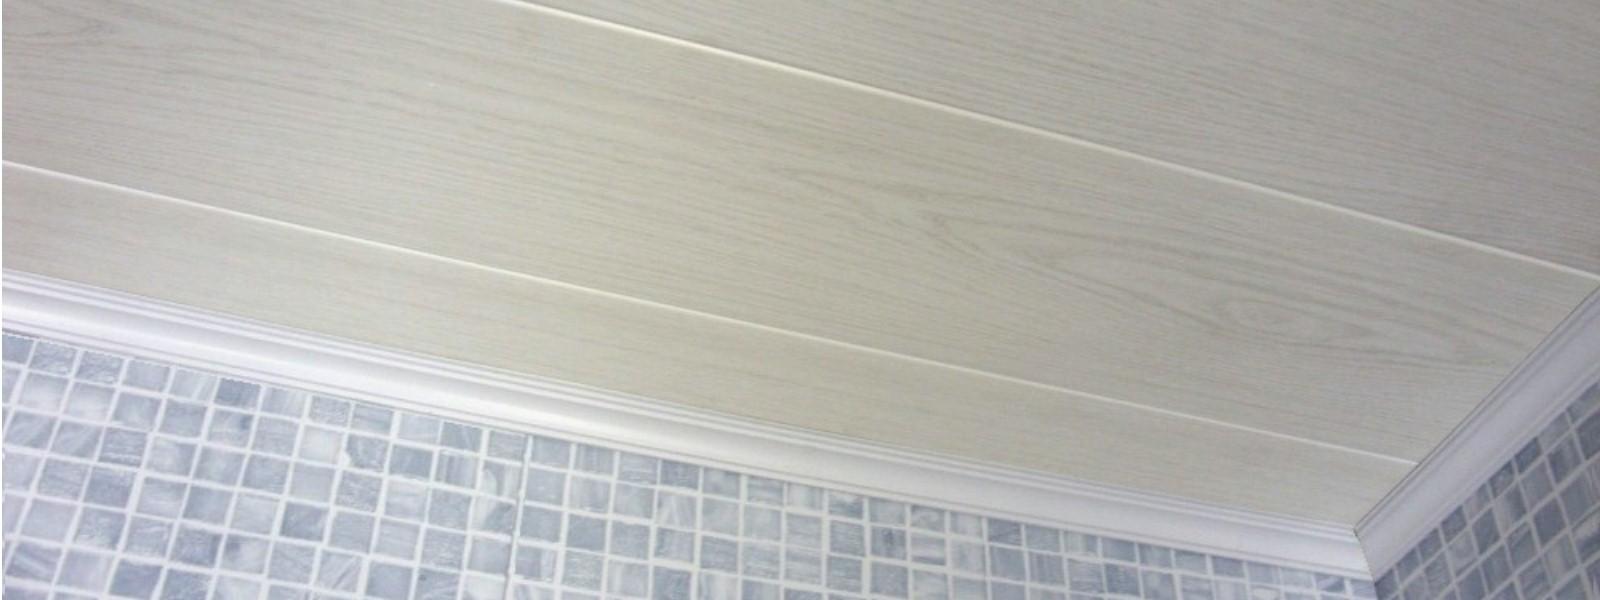 slide2 ceiling panels - Ceiling Panel Coving Trim